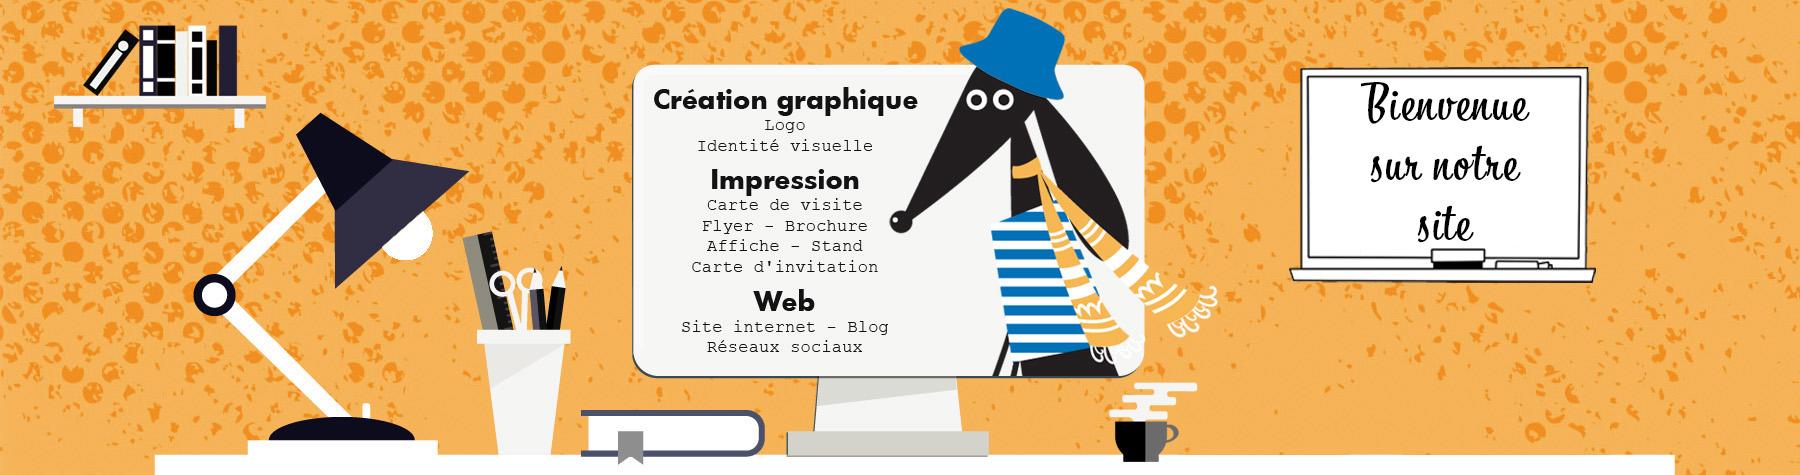 Agence Communication Web Sites Internet Rennes 35 Acign Bretagne